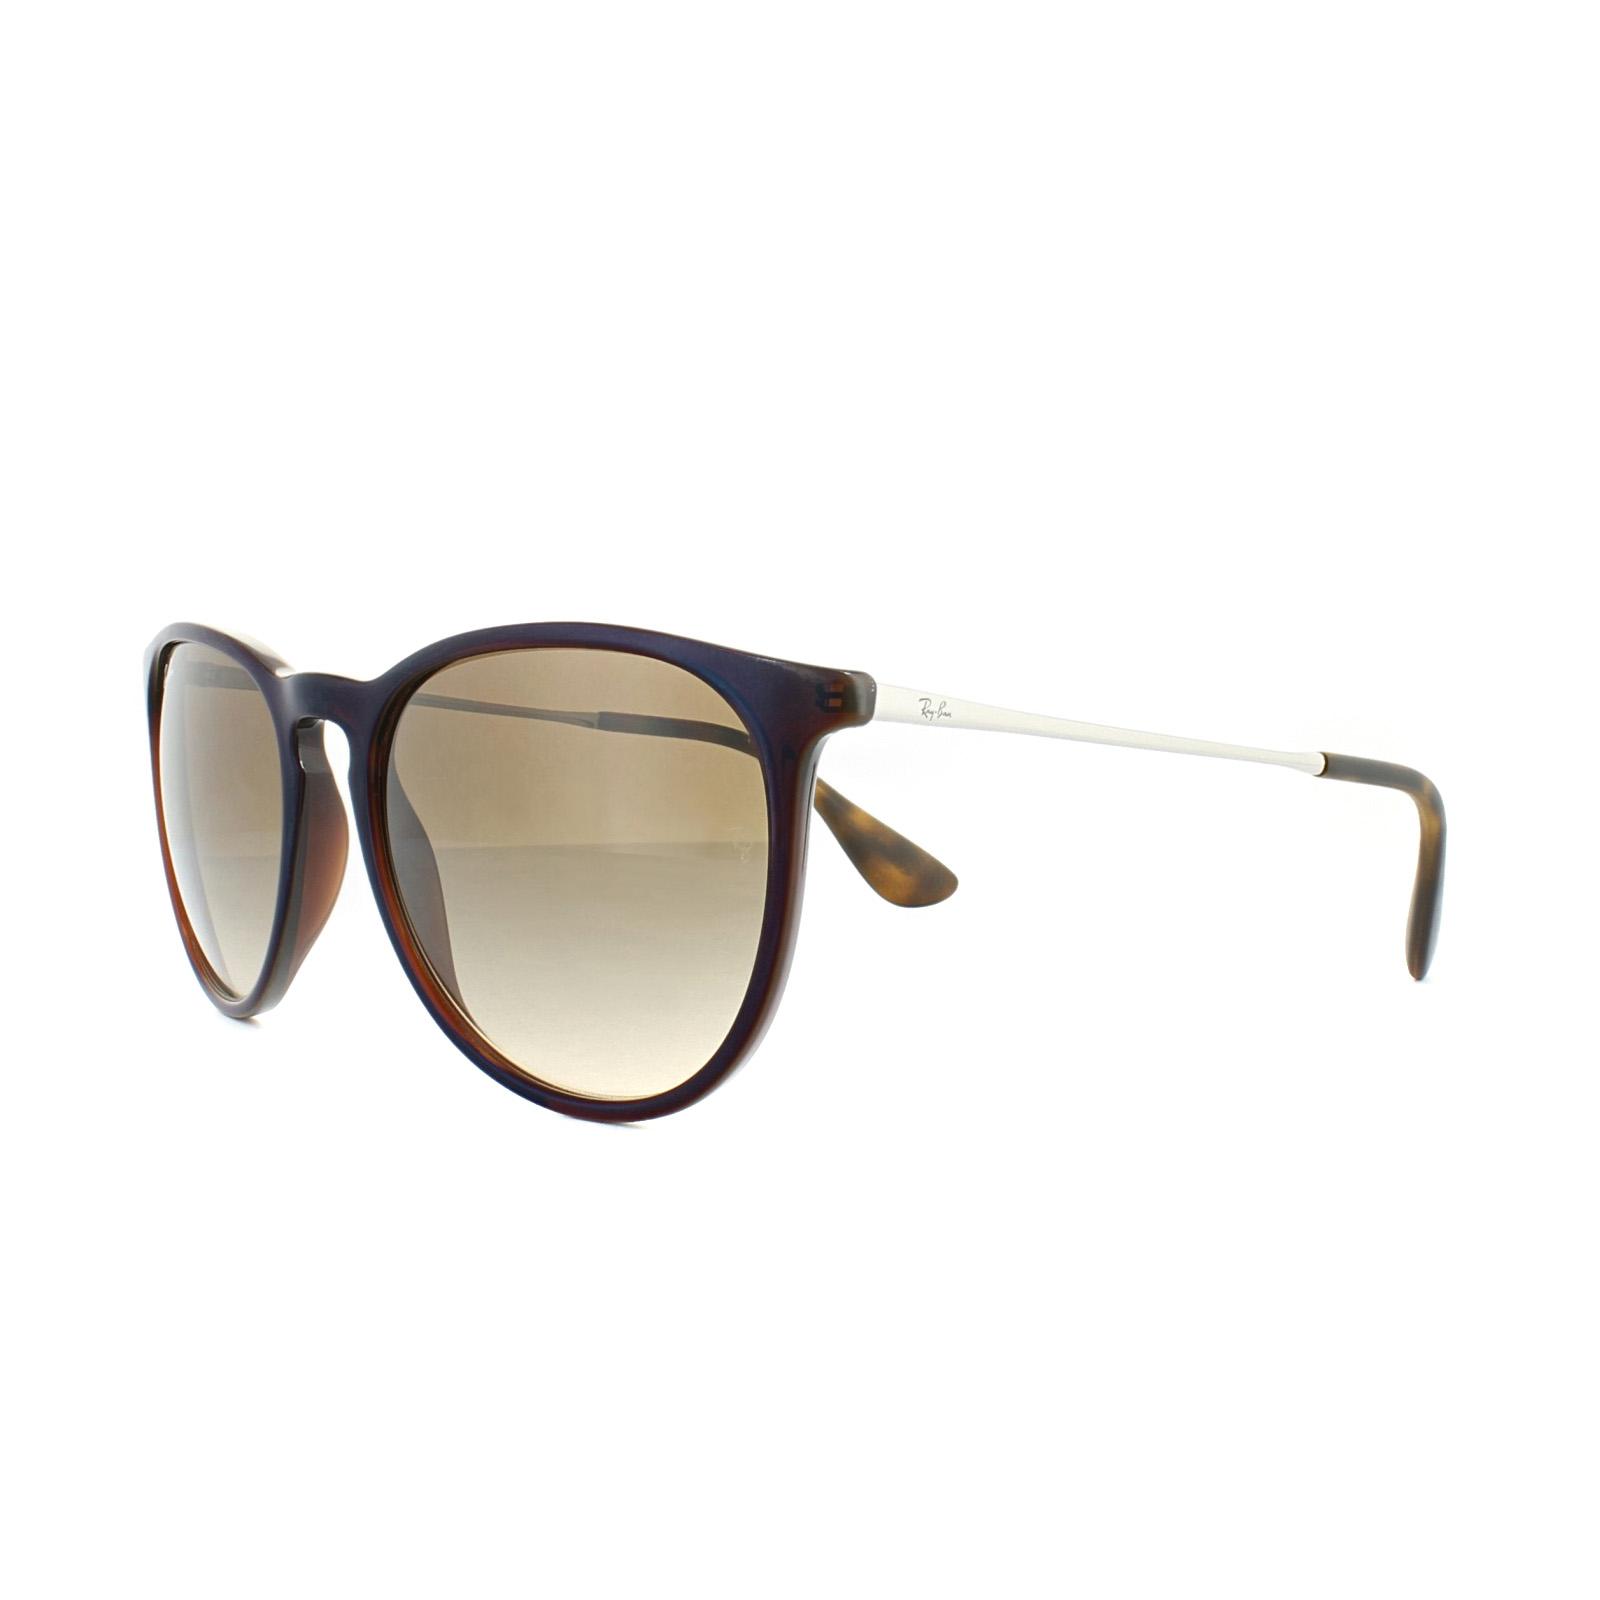 c29dfaa1c4f9a Sentinel Ray-Ban Sunglasses Erika 4171 631513 Brown Blue Brown Gradient